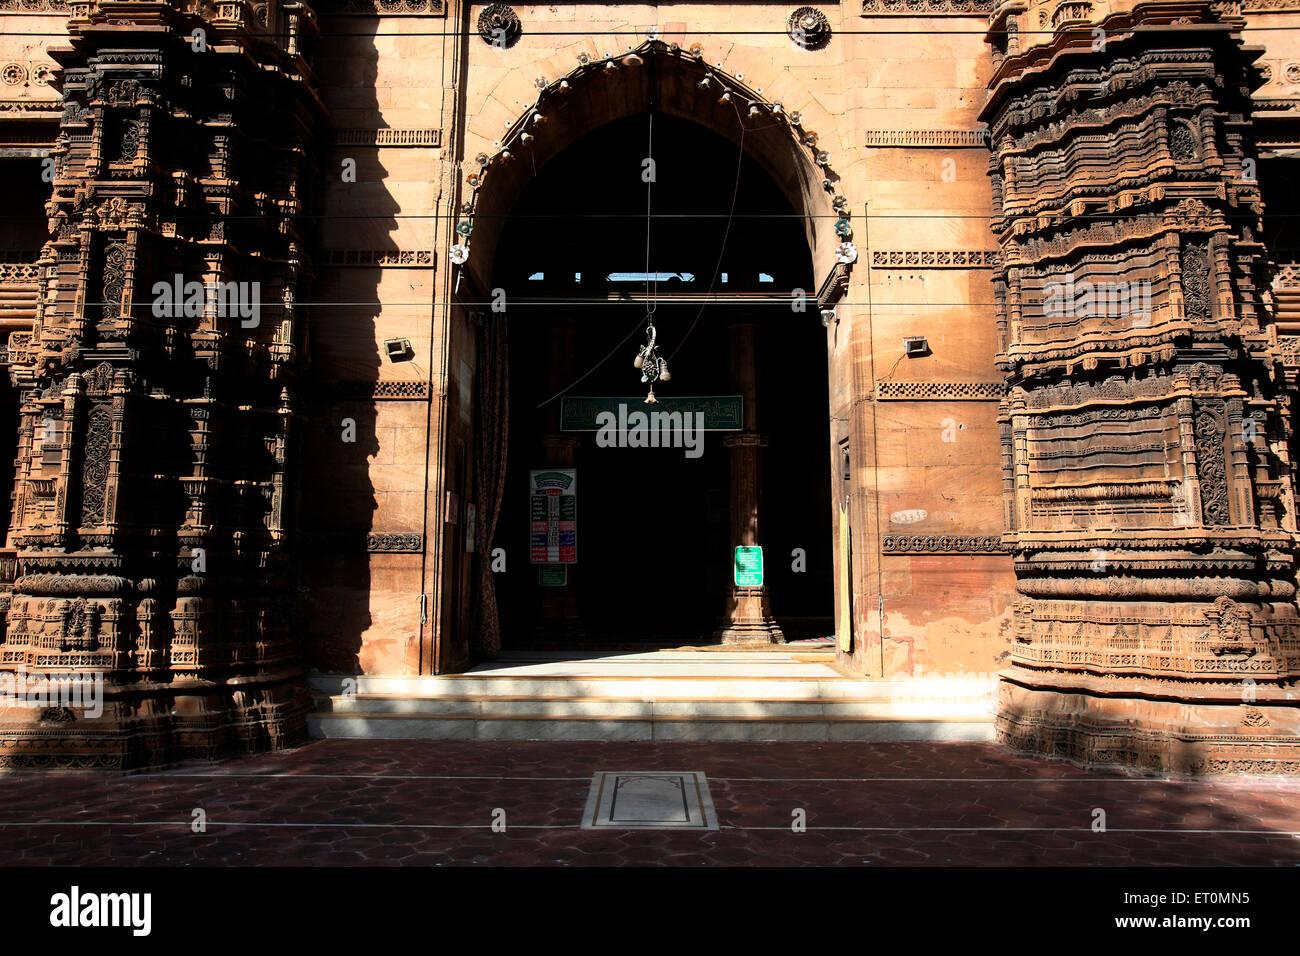 Rani Rupmati mosque established in 1430 1440 AD Ahmedabad  Gujarat ; India - Stock Image